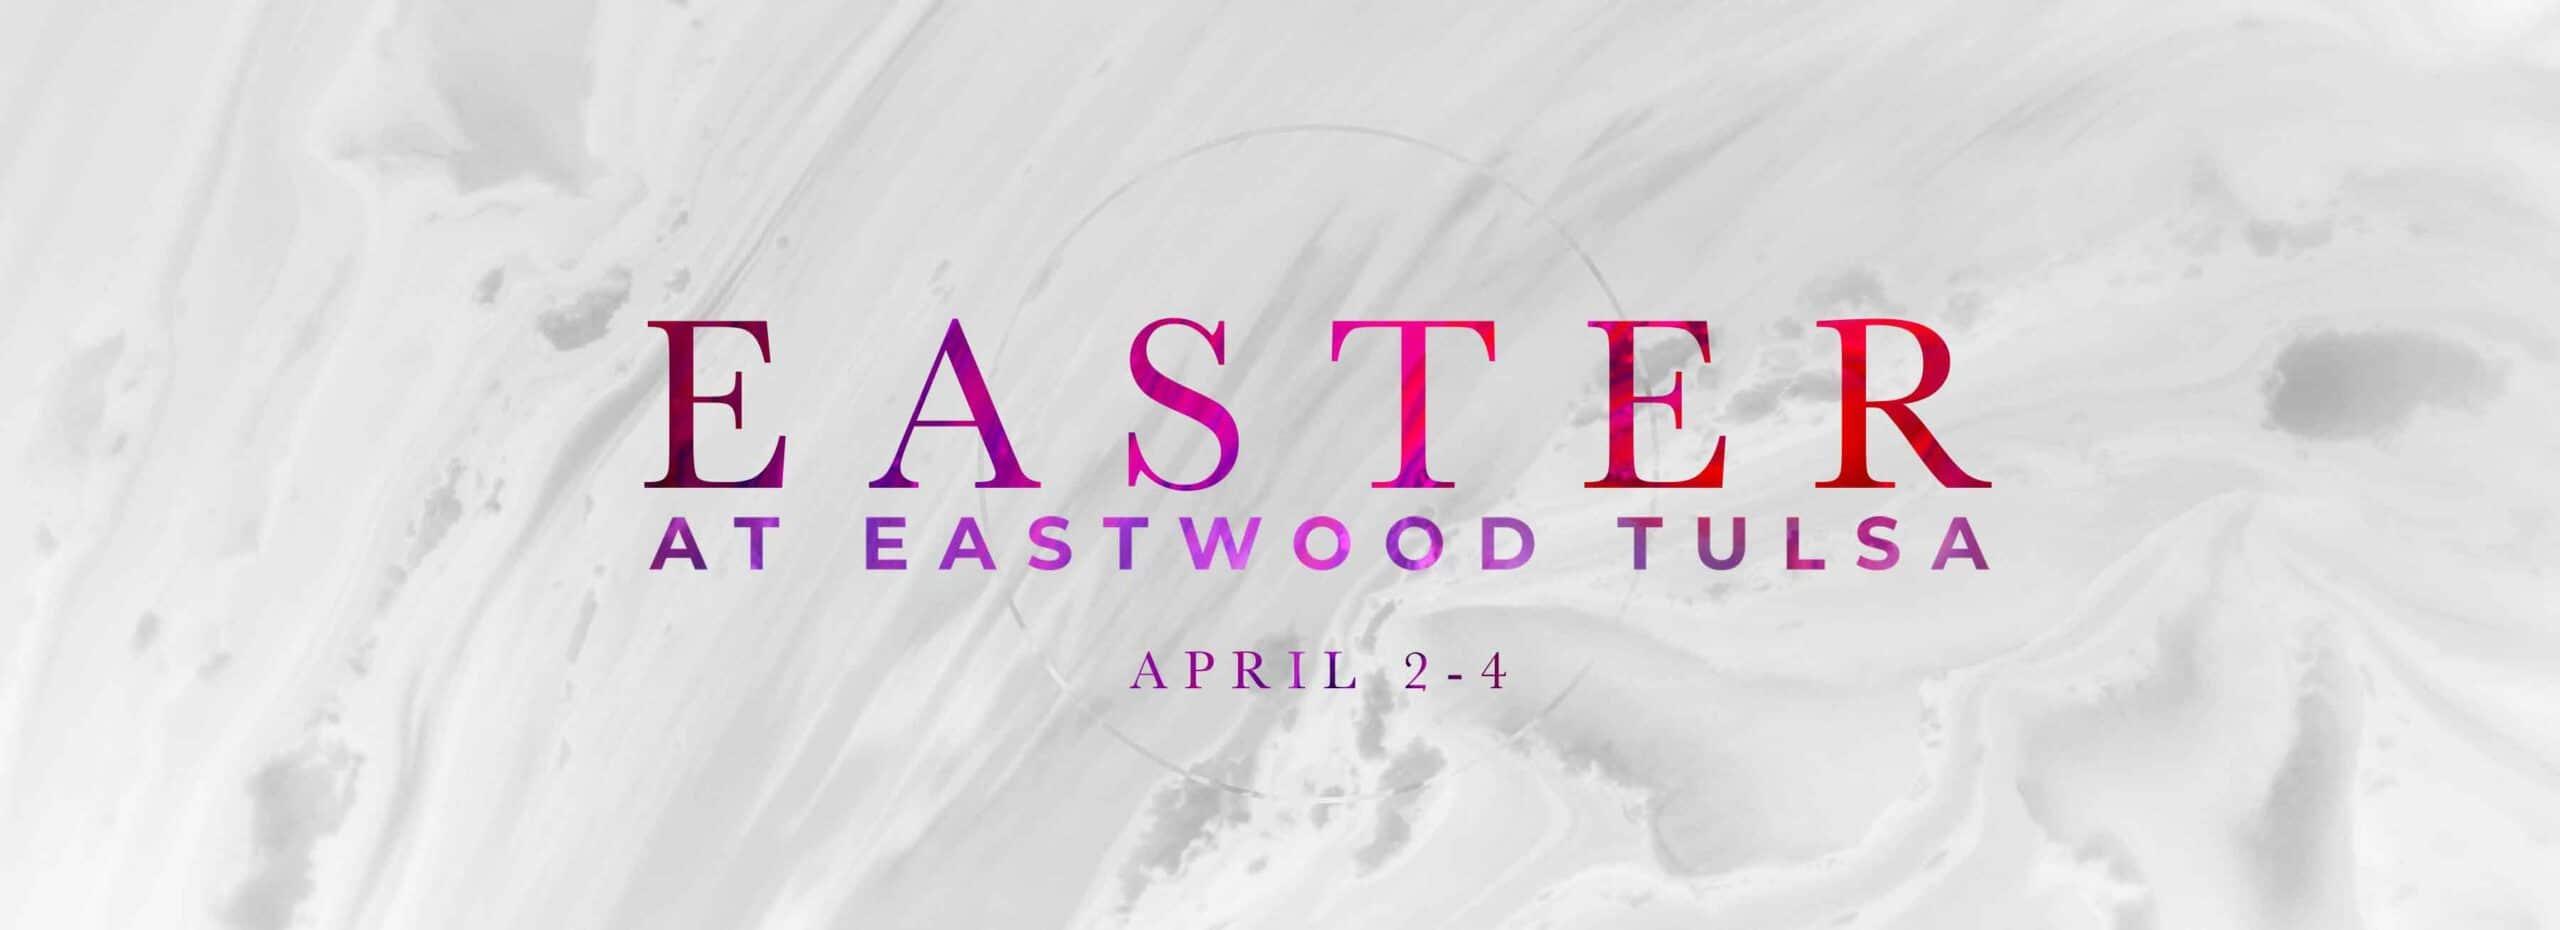 Easter at Eastwood Tulsa Slider 3600x1100